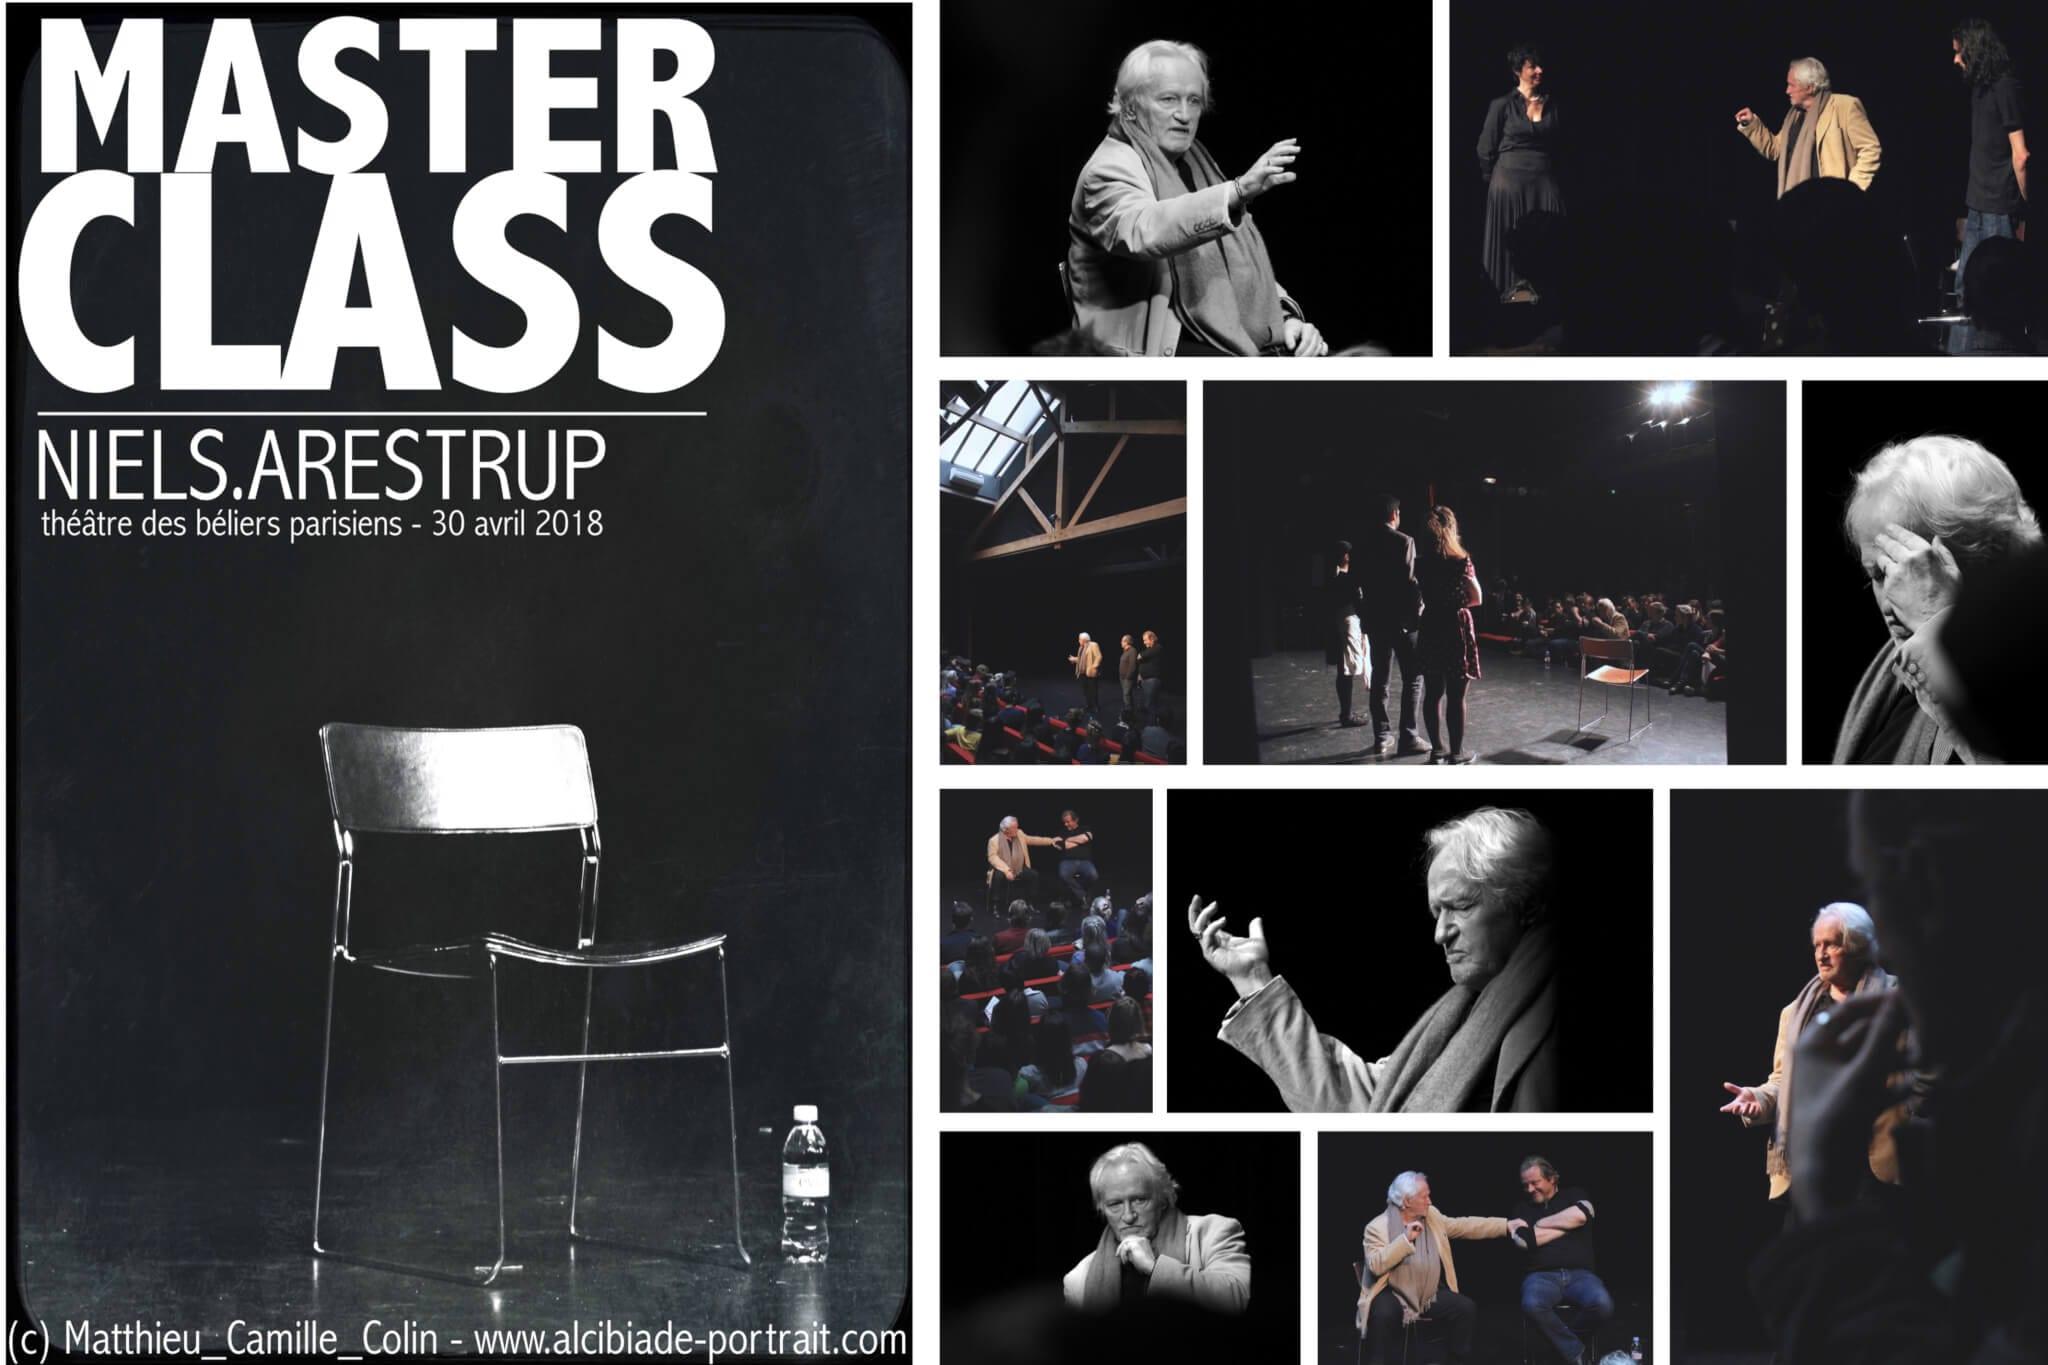 Masterclass de Niels Arestrup